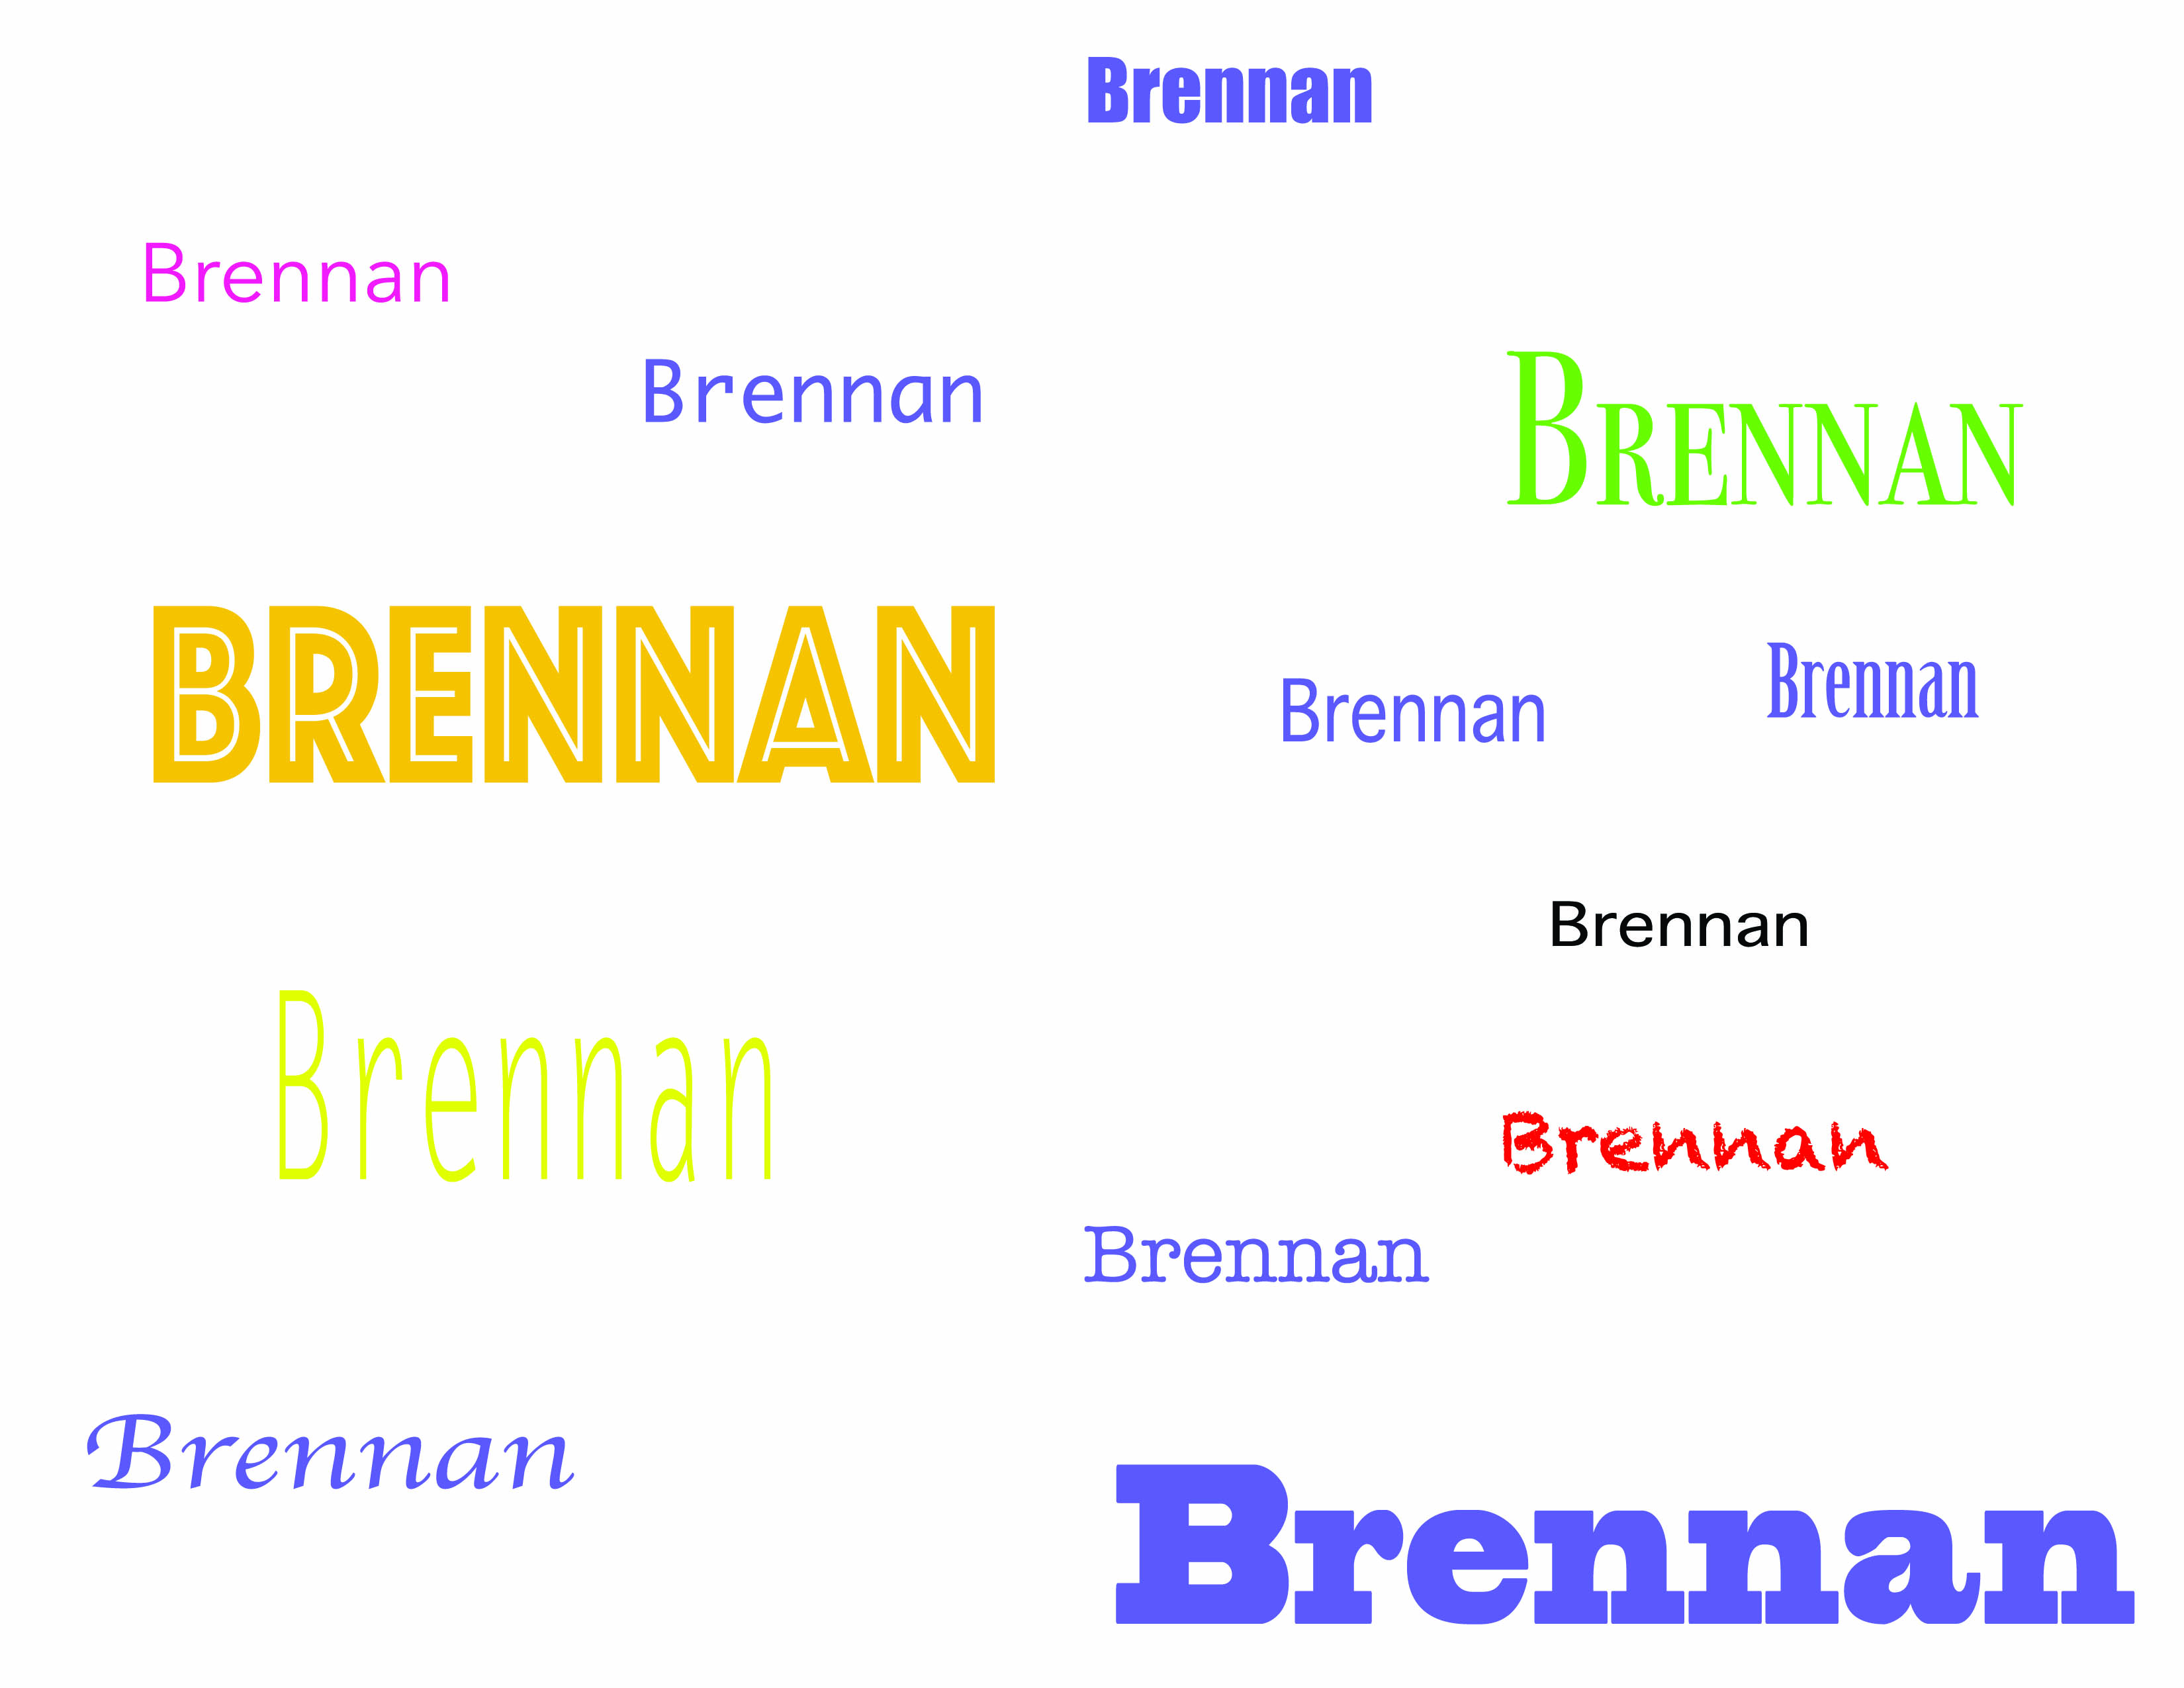 brennan_name